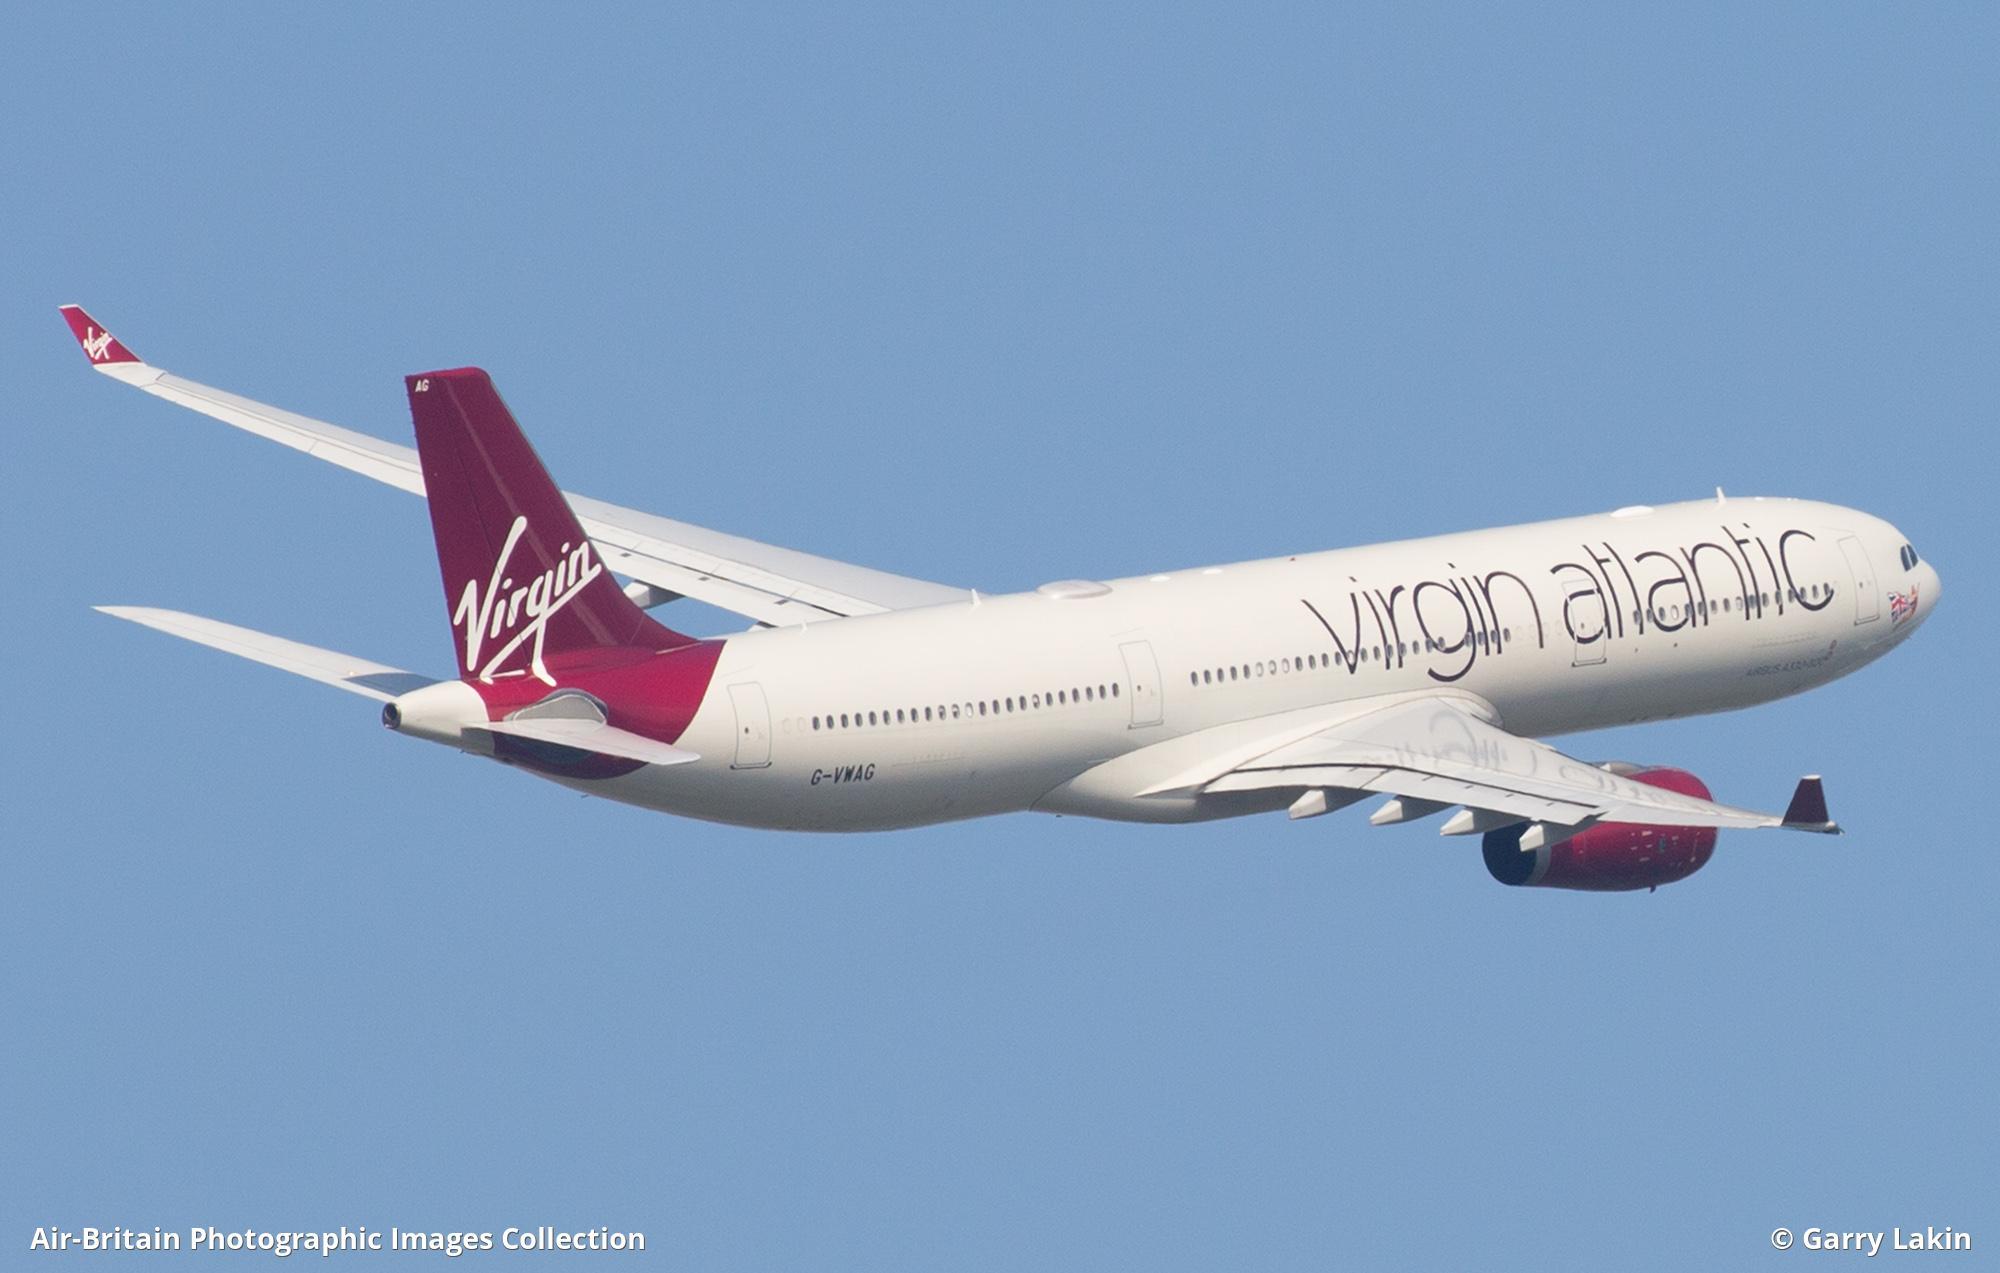 Airbus A330-343E, G-VWAG / 1341, Virgin Atlantic (VS / VIR) : ABPic